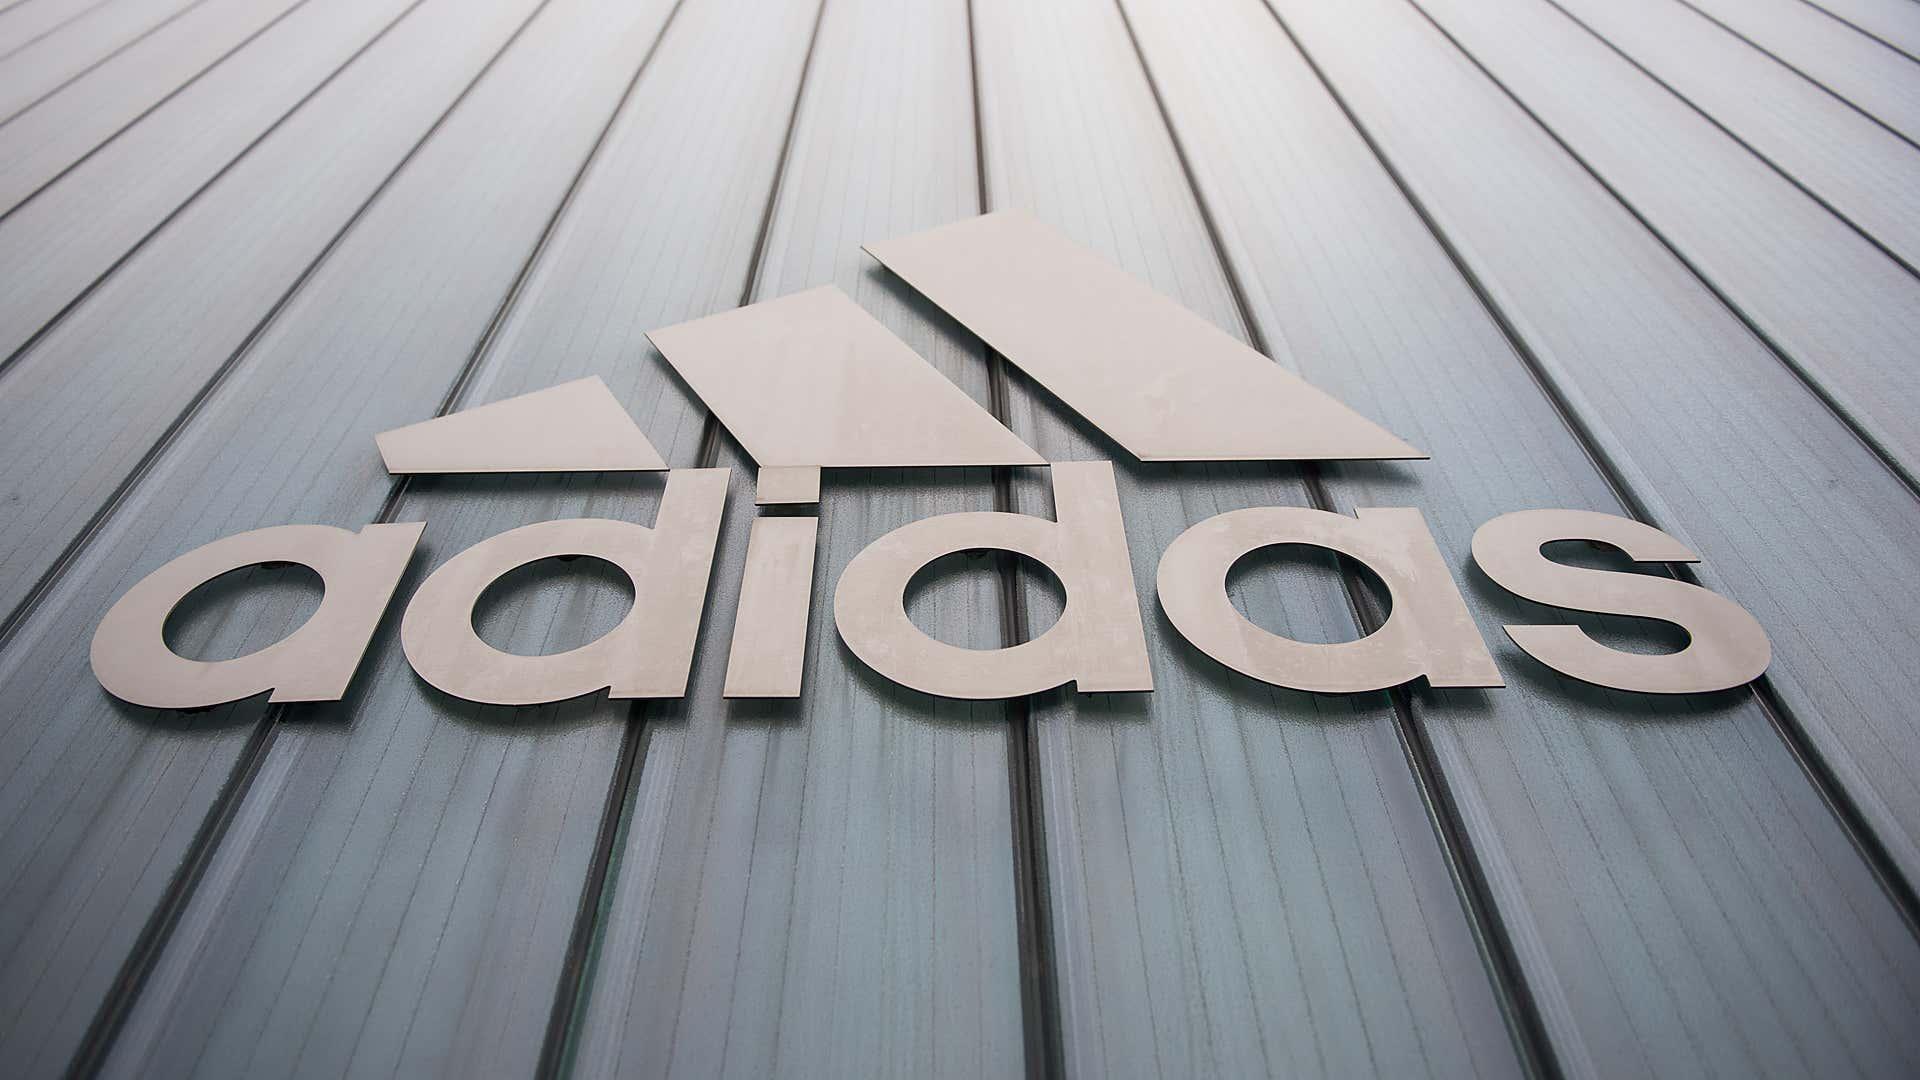 Von Paul Pogba kreiert: Adidas präsentiert ersten veganen Fußballschuh   Goal.com